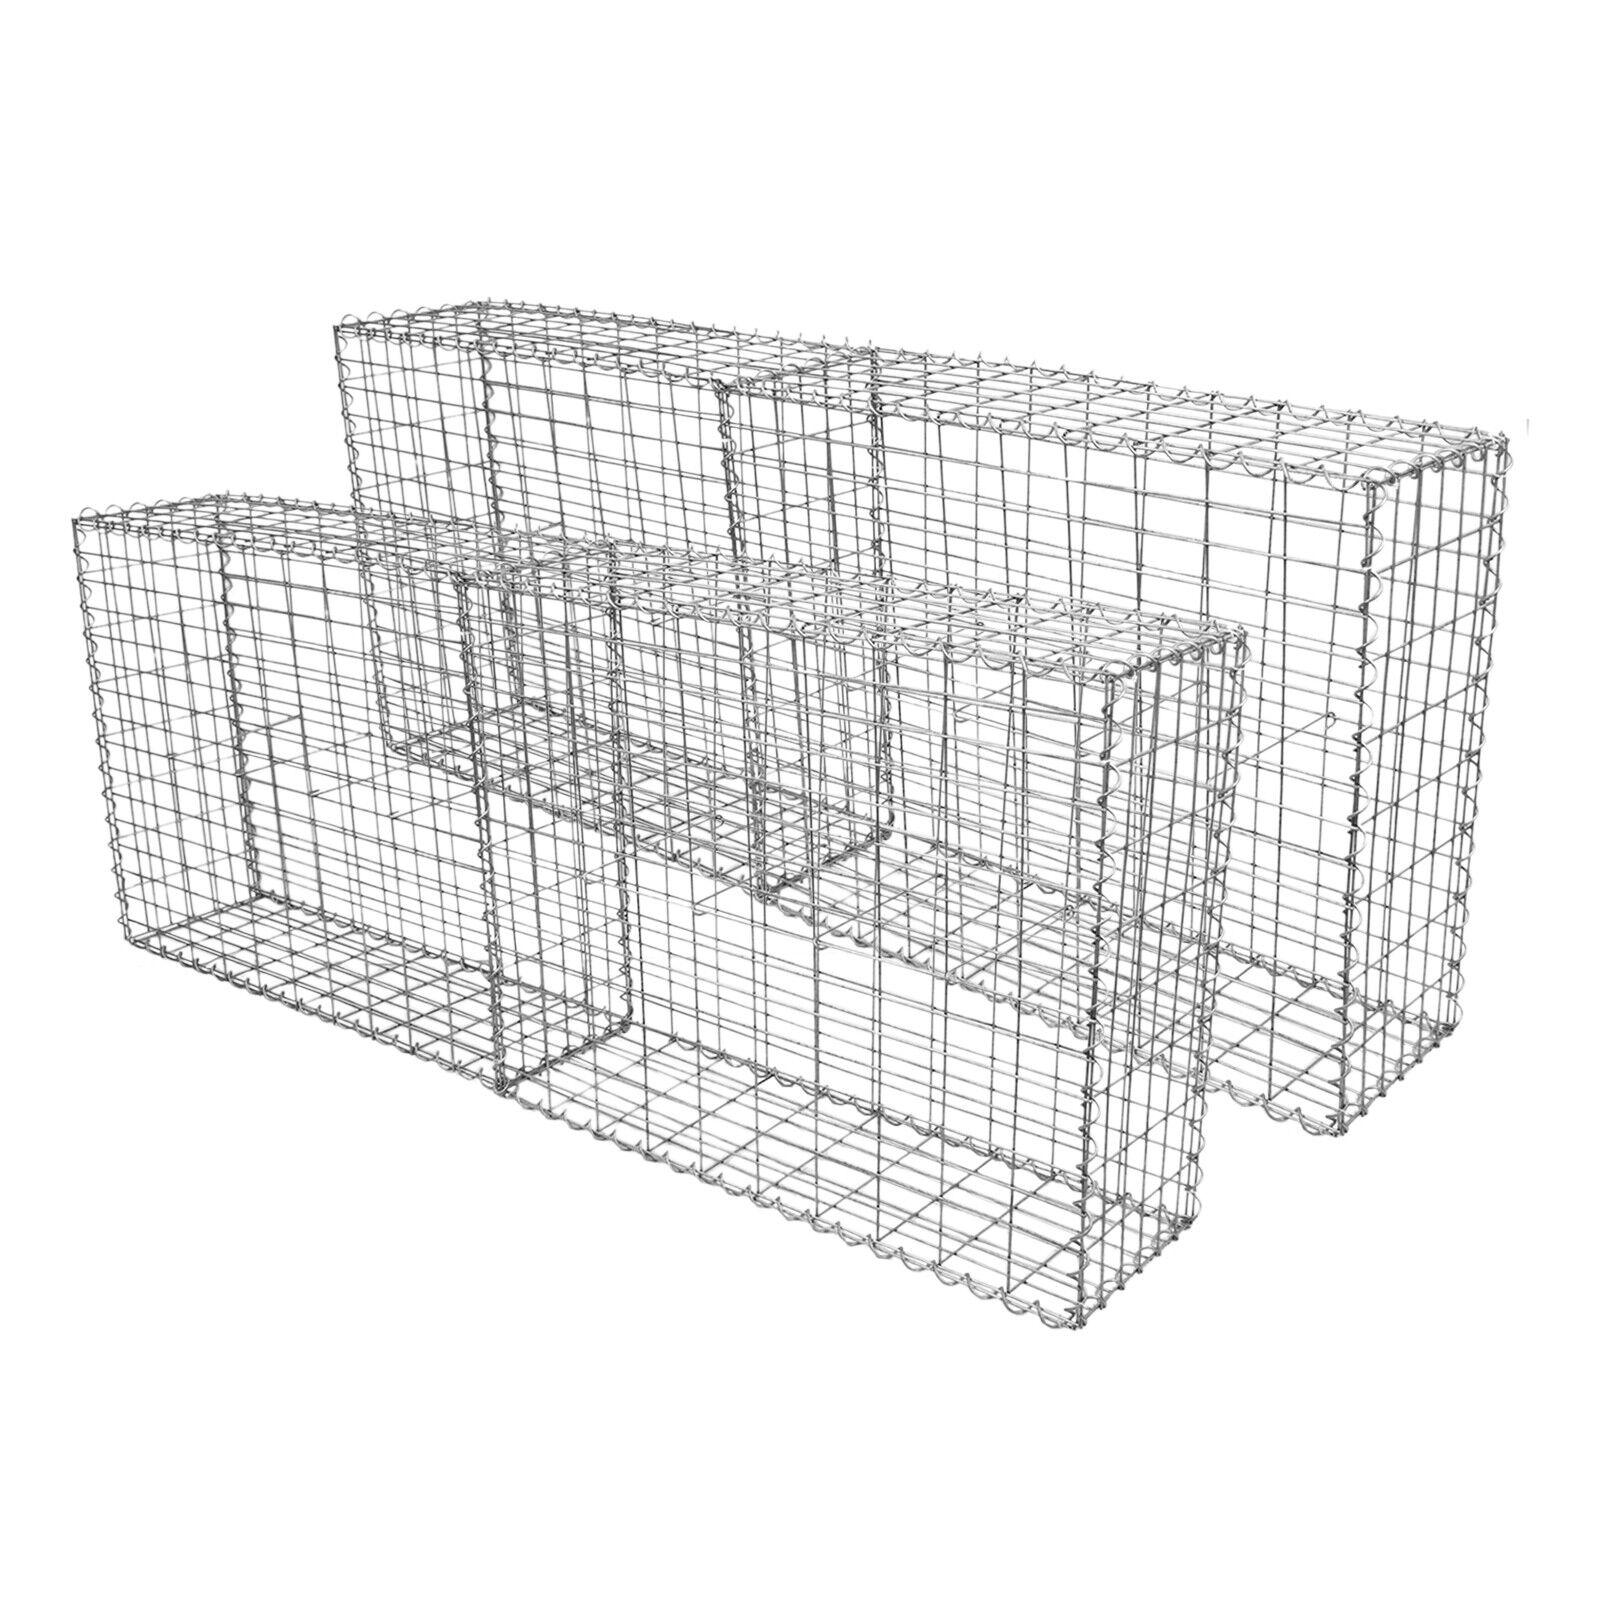 4 Cestas de Acero Galvanizado de Exterior Jaulas para Decoración 100 x 80 x 30cm